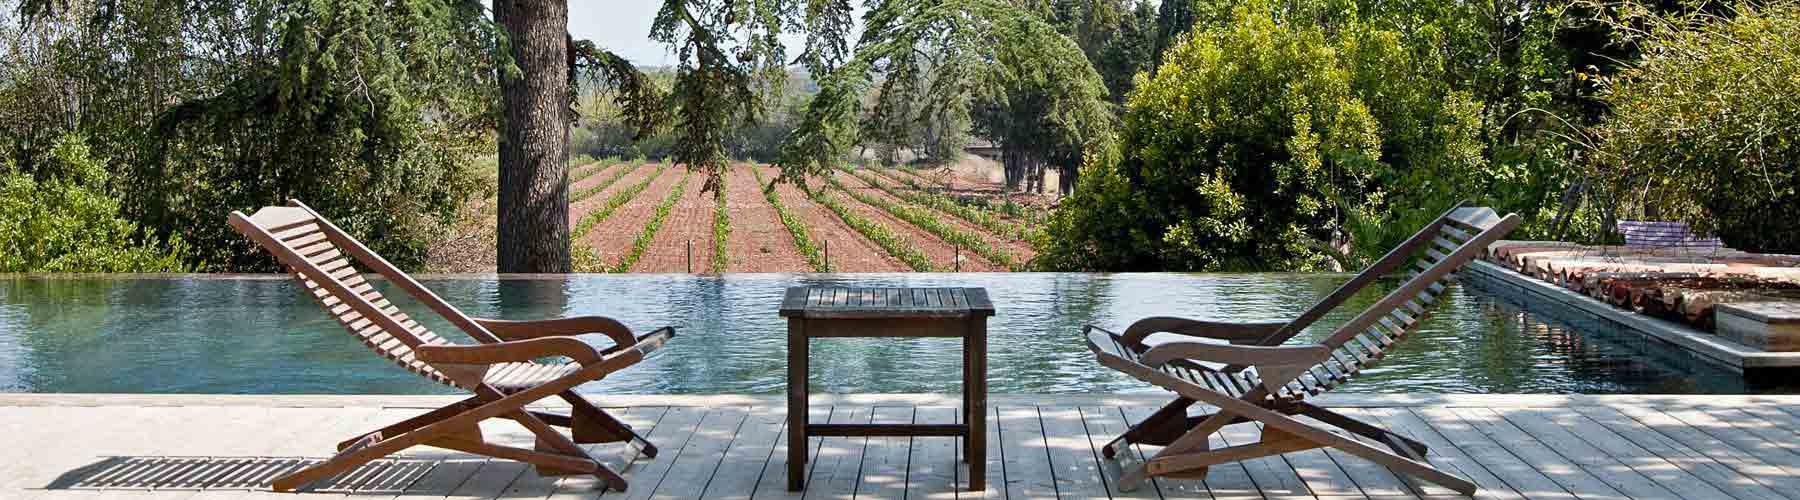 Chambre d 39 h te var provence piscine chauff e int rieure spa sauna - Chambre d hote piscine interieure ...